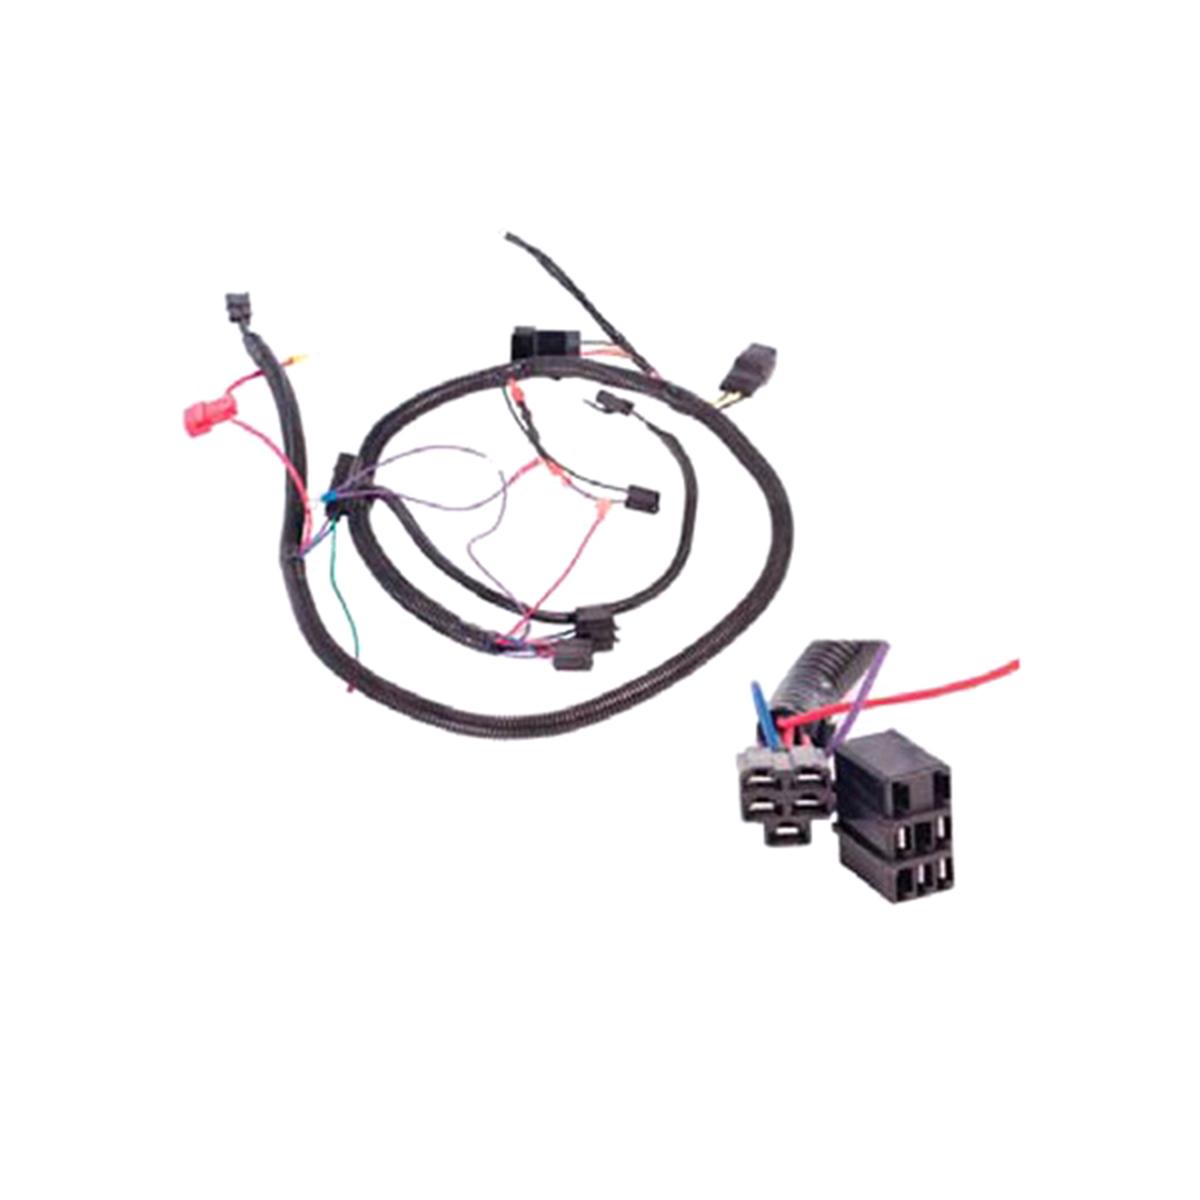 dixie chopper wiring diagram 2010 ford f150 fuse panel 500073 kohler 40hp harness jpg